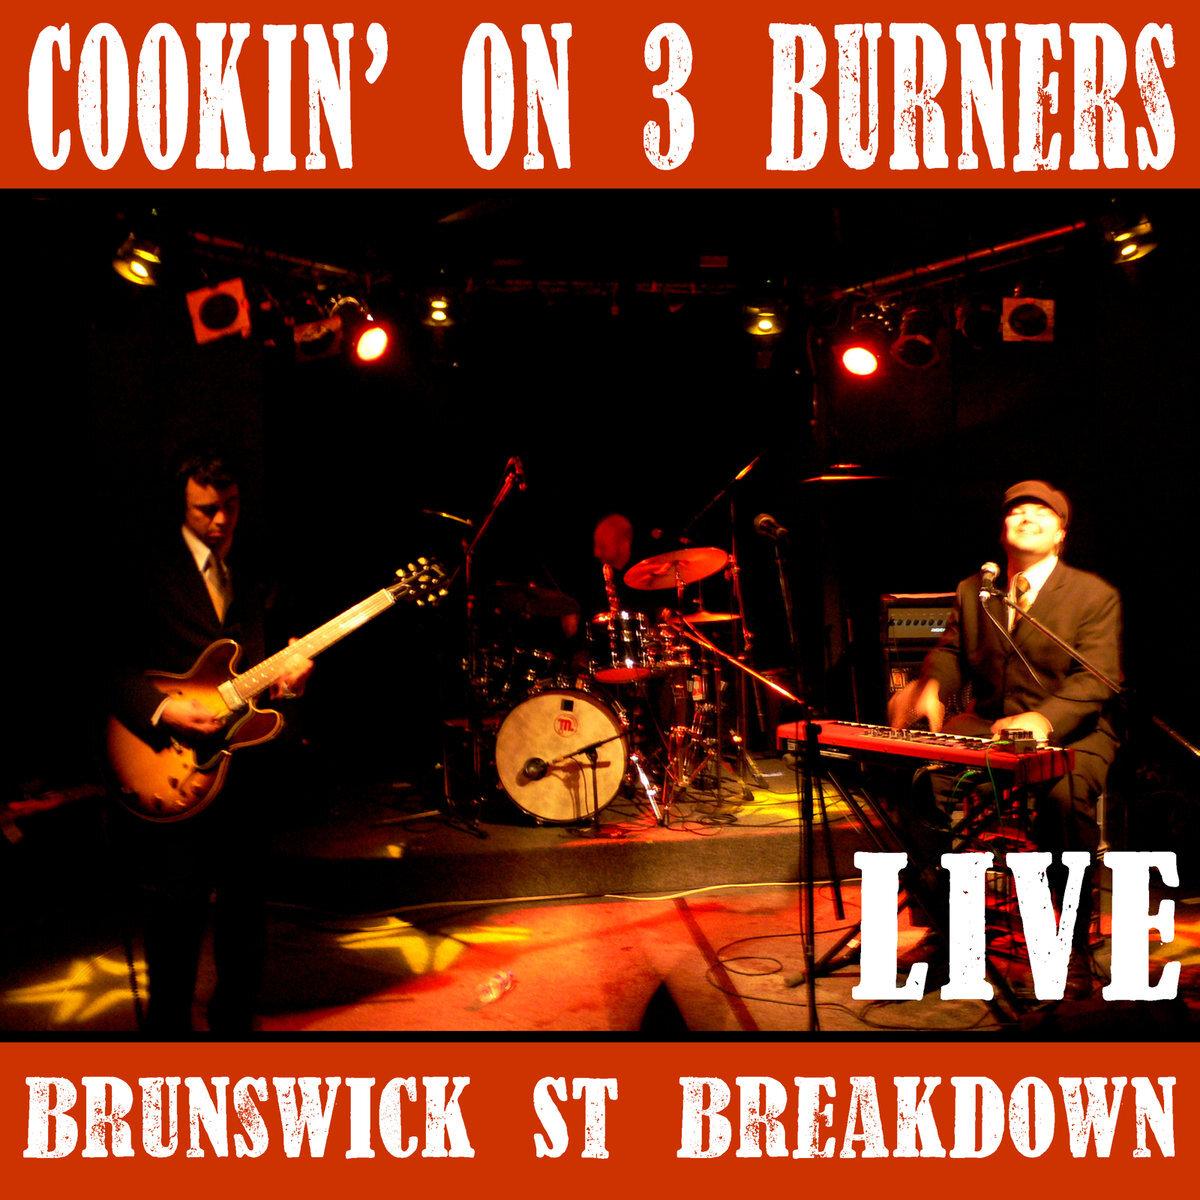 42. cookin' on 3 burners - 'brunswick st breakdown'  digital album (independent) 2007  1. redback (live) 2. keb's bucket (live) 3. Mango Skin (live) 4. briar patch (live) 5. funky miracle (live) 6. pie warmer (live) 7. hook & sling (live) 8. cressy street breakdown (live) 9. Gravel Rash (live)